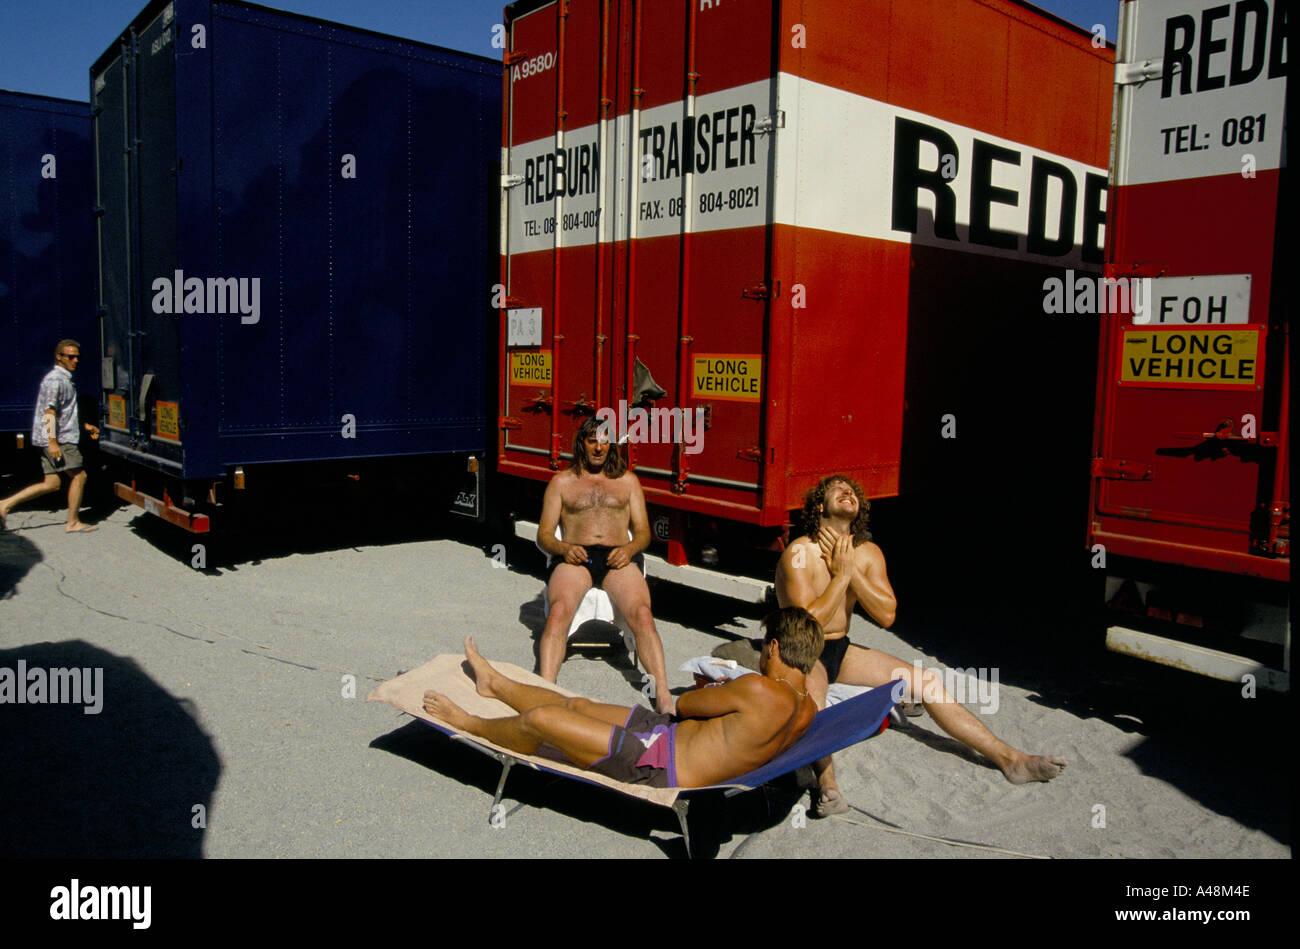 Roadies for U2 sunbathing during the zooropa tour of europe - Stock Image